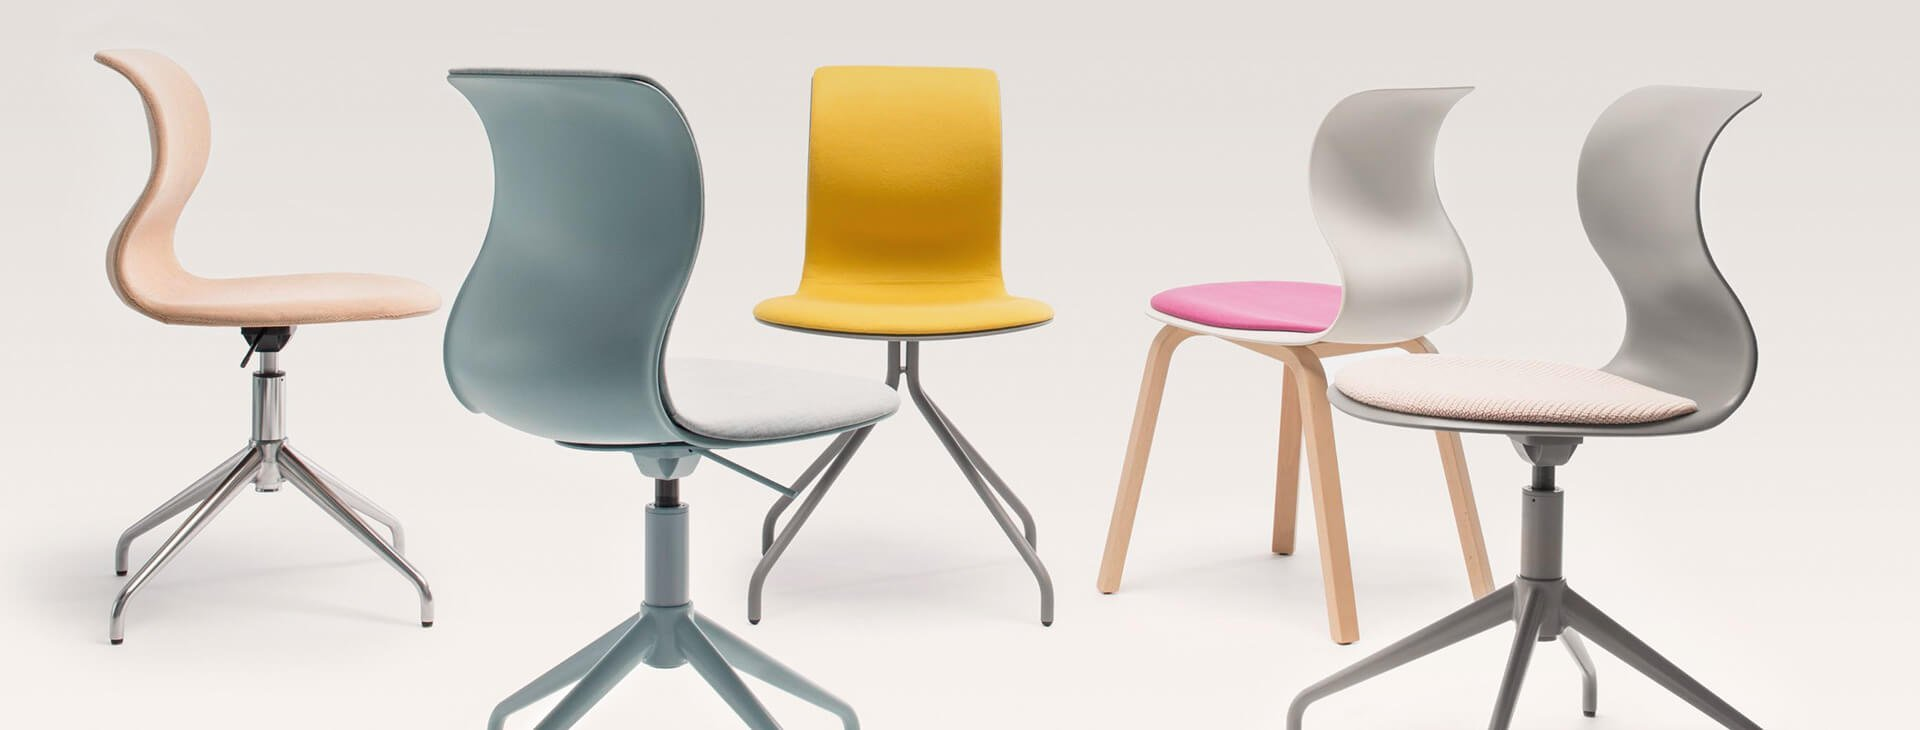 fl totto ihre brands im stilwerk berlin. Black Bedroom Furniture Sets. Home Design Ideas